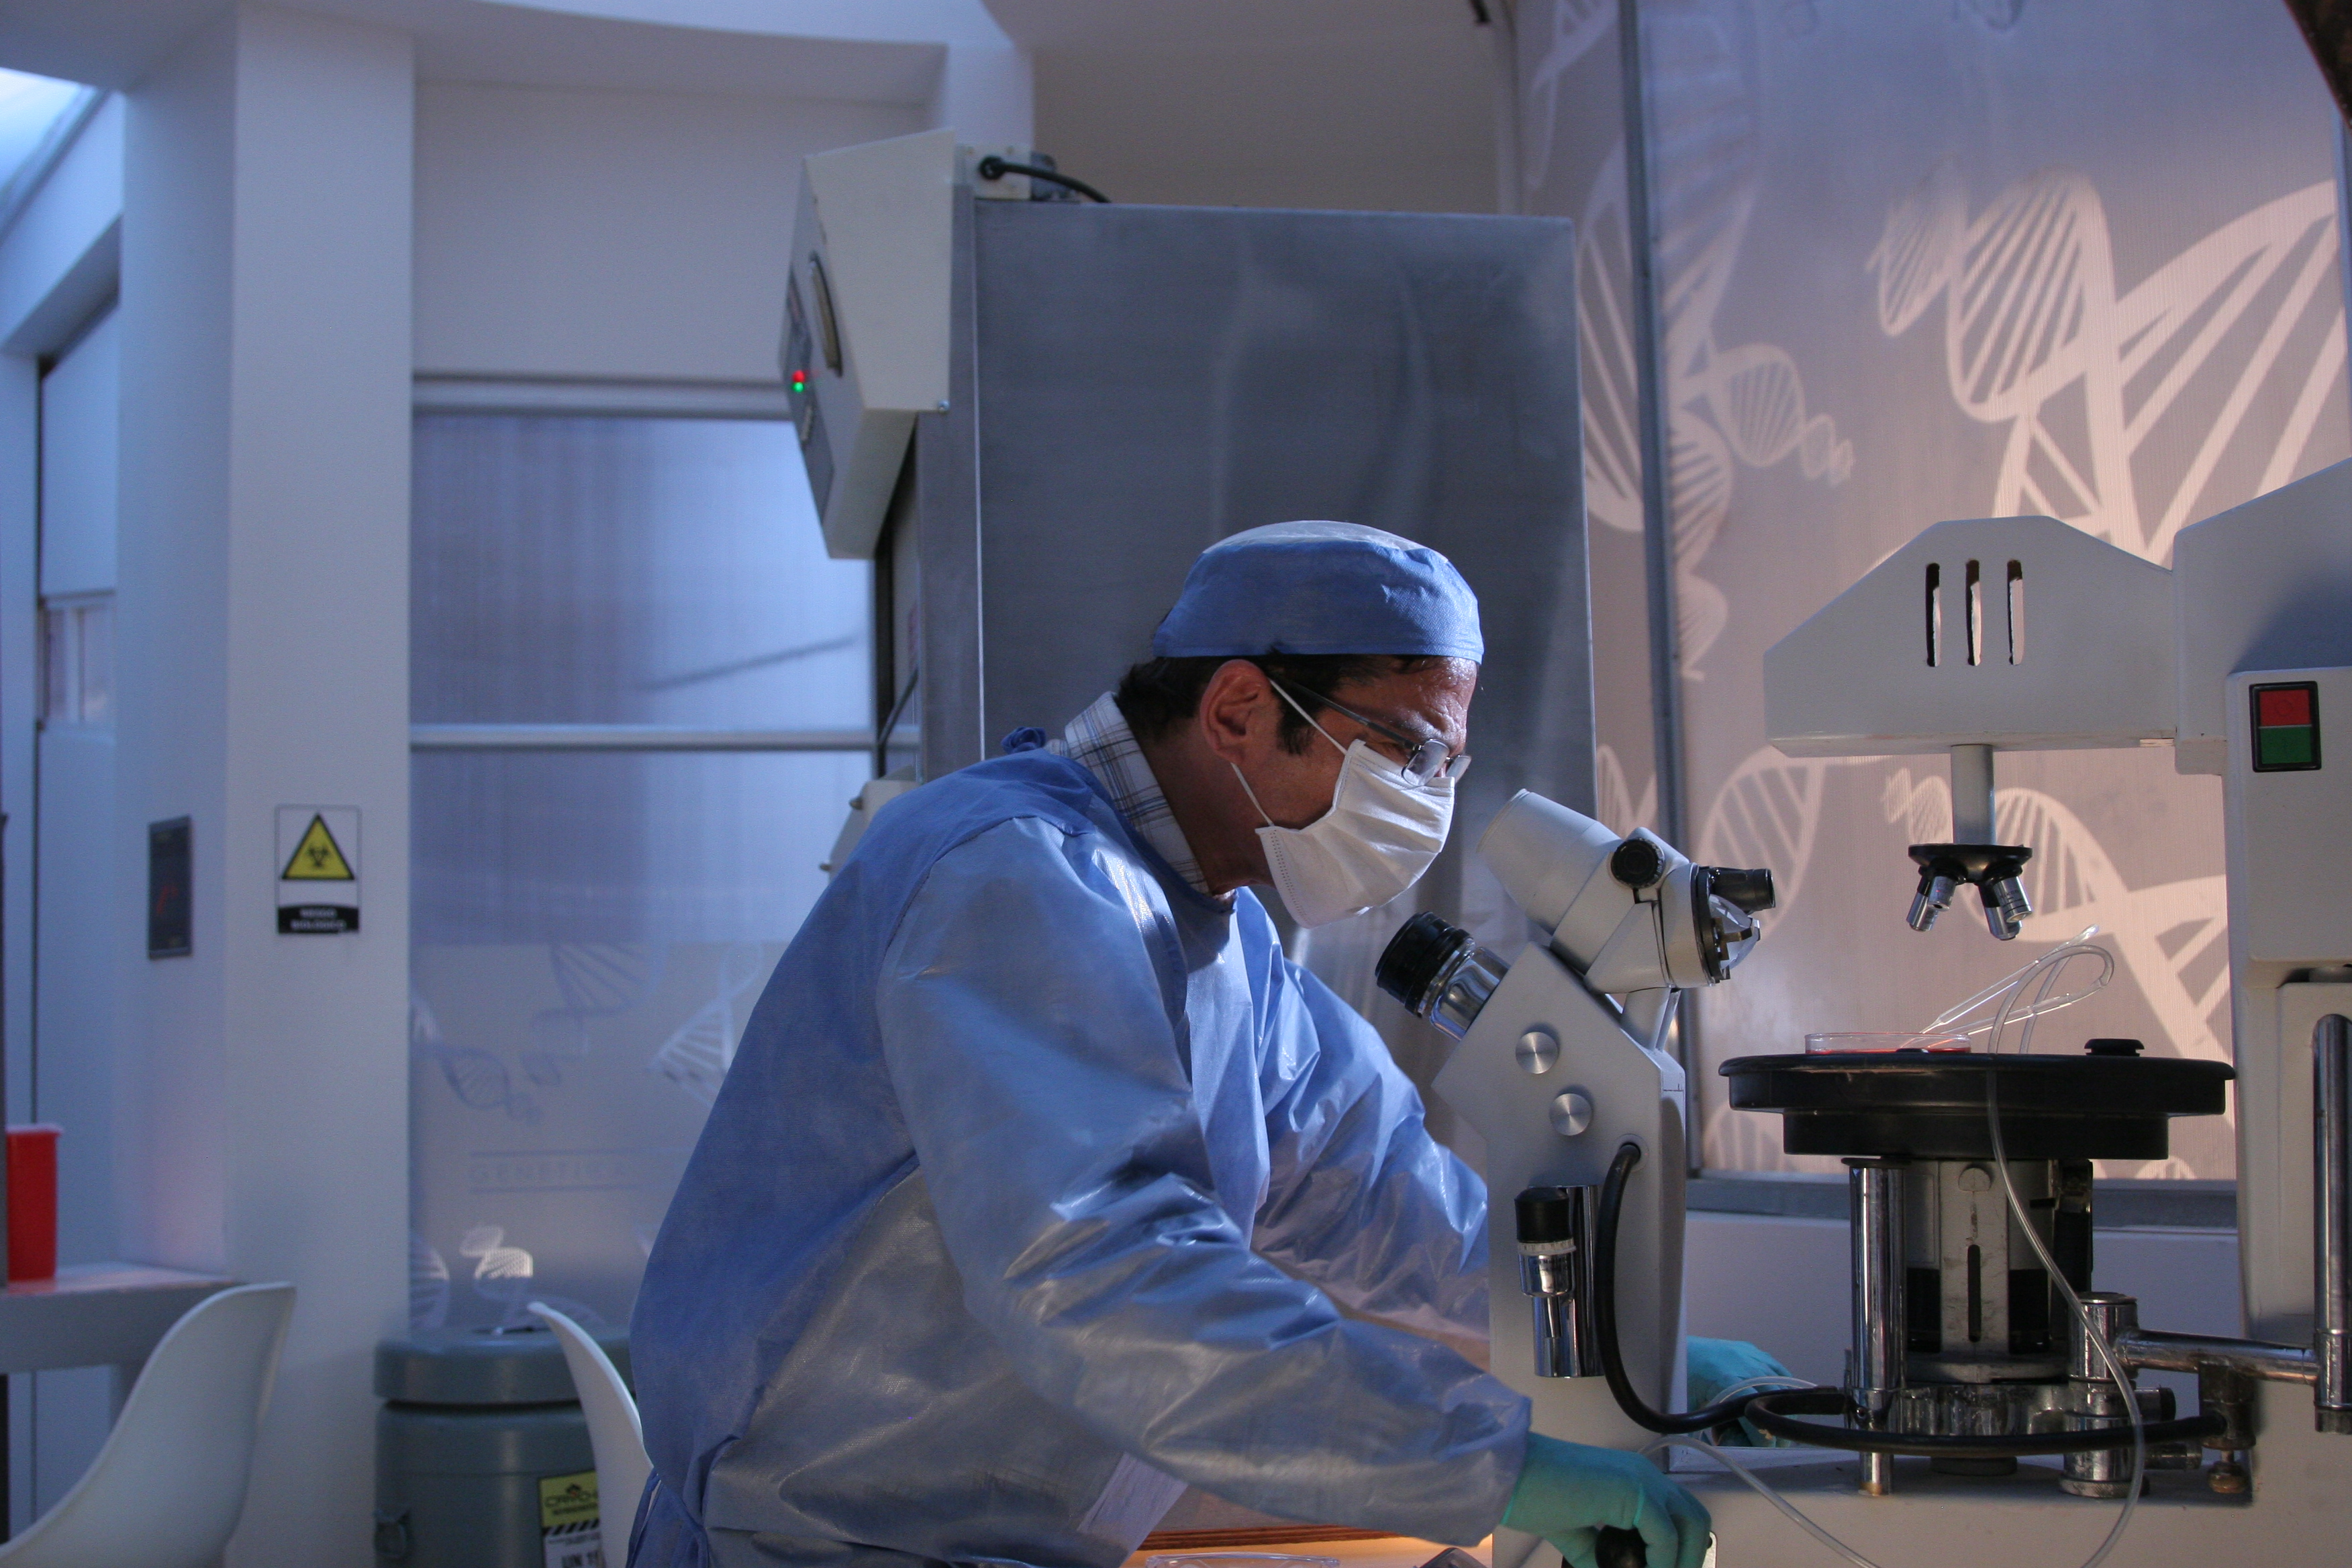 Laboratorio donde se hizo el clon-estudio